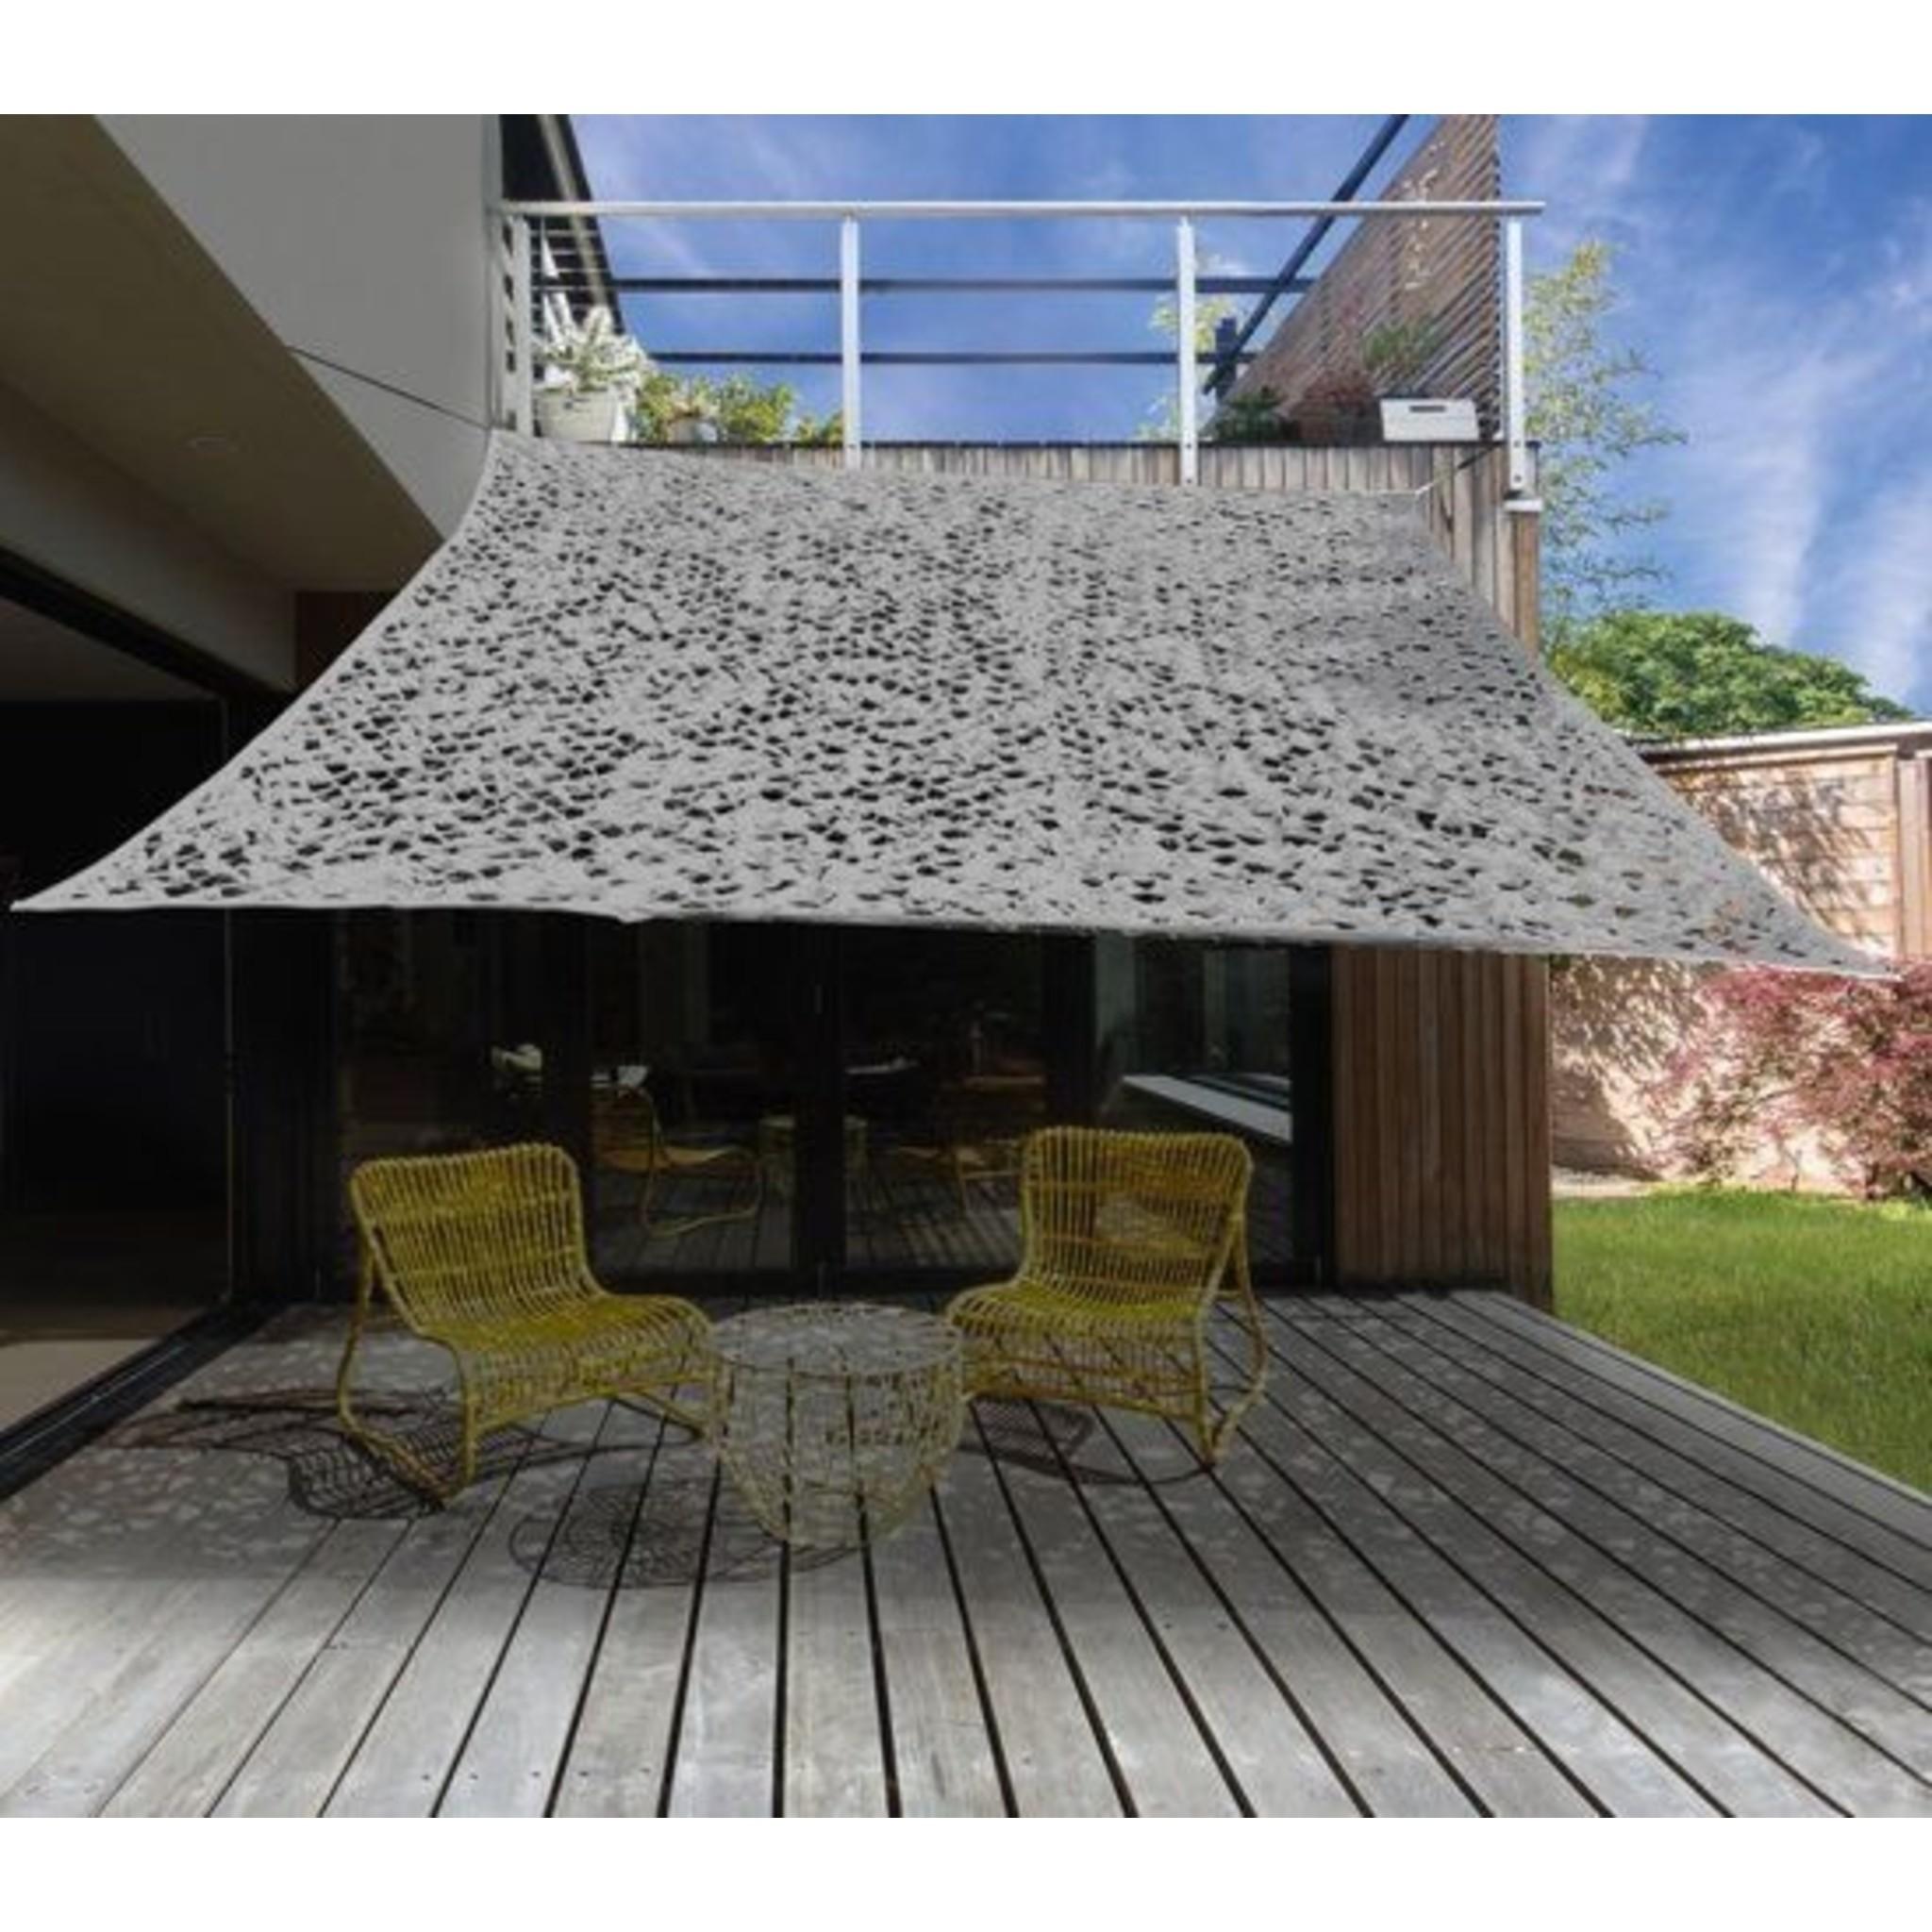 Camouflage / Schaduw Net - 3x3 meter - Licht Grijs